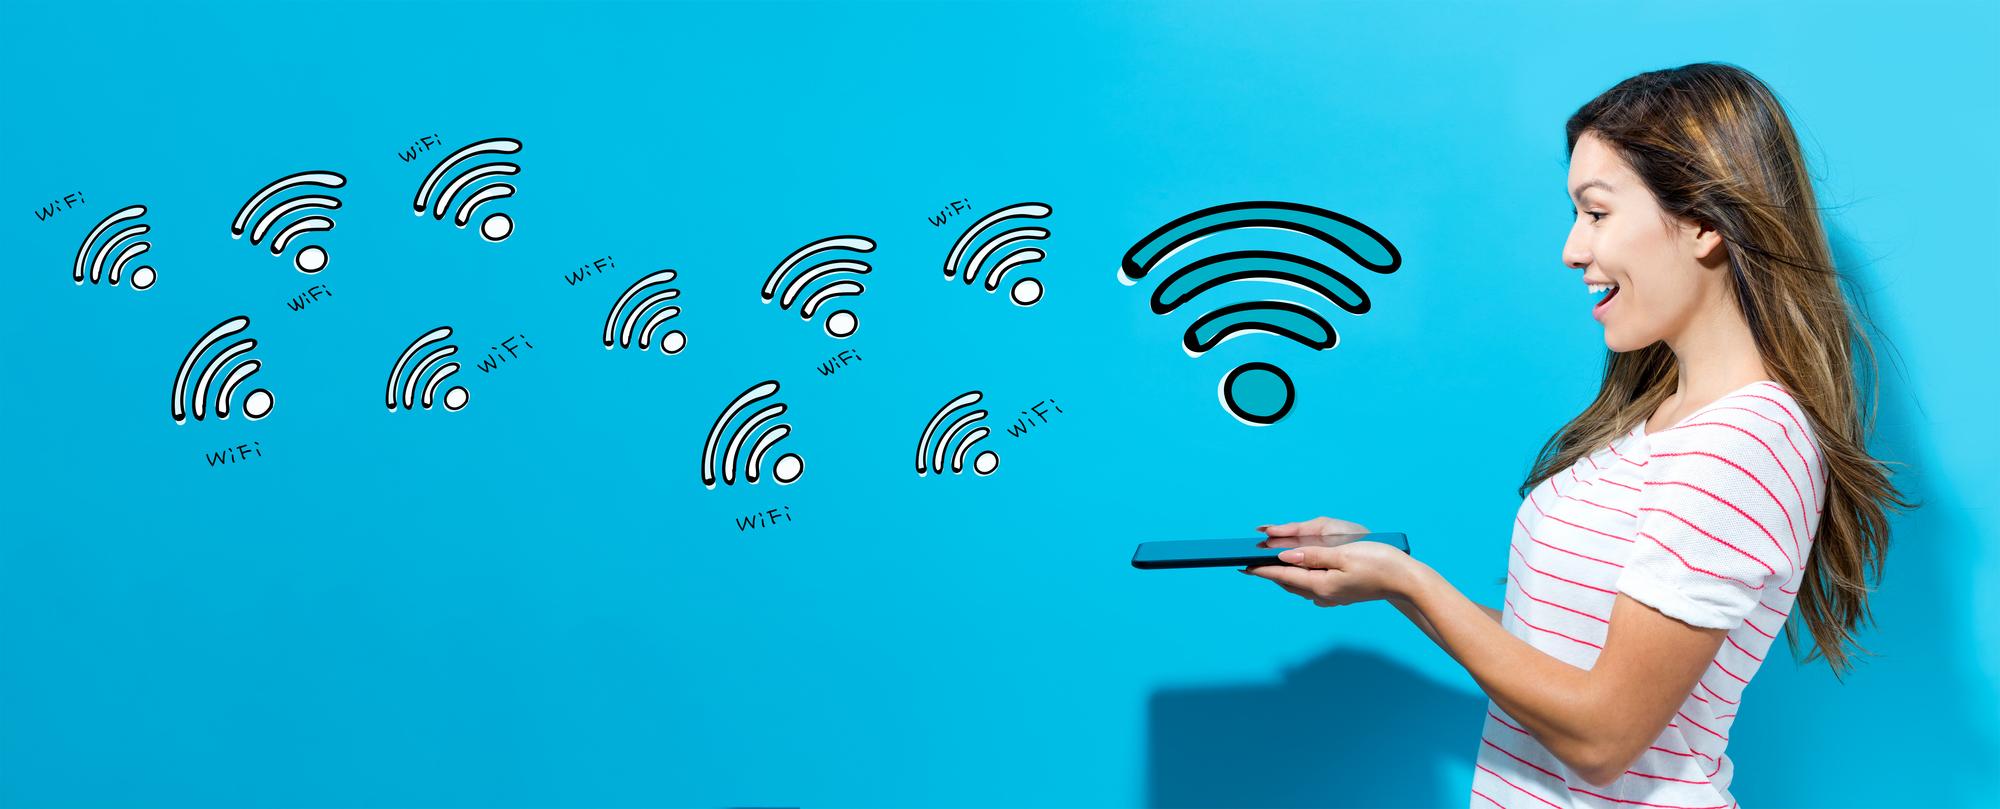 Wi-Fiのイメージ画像